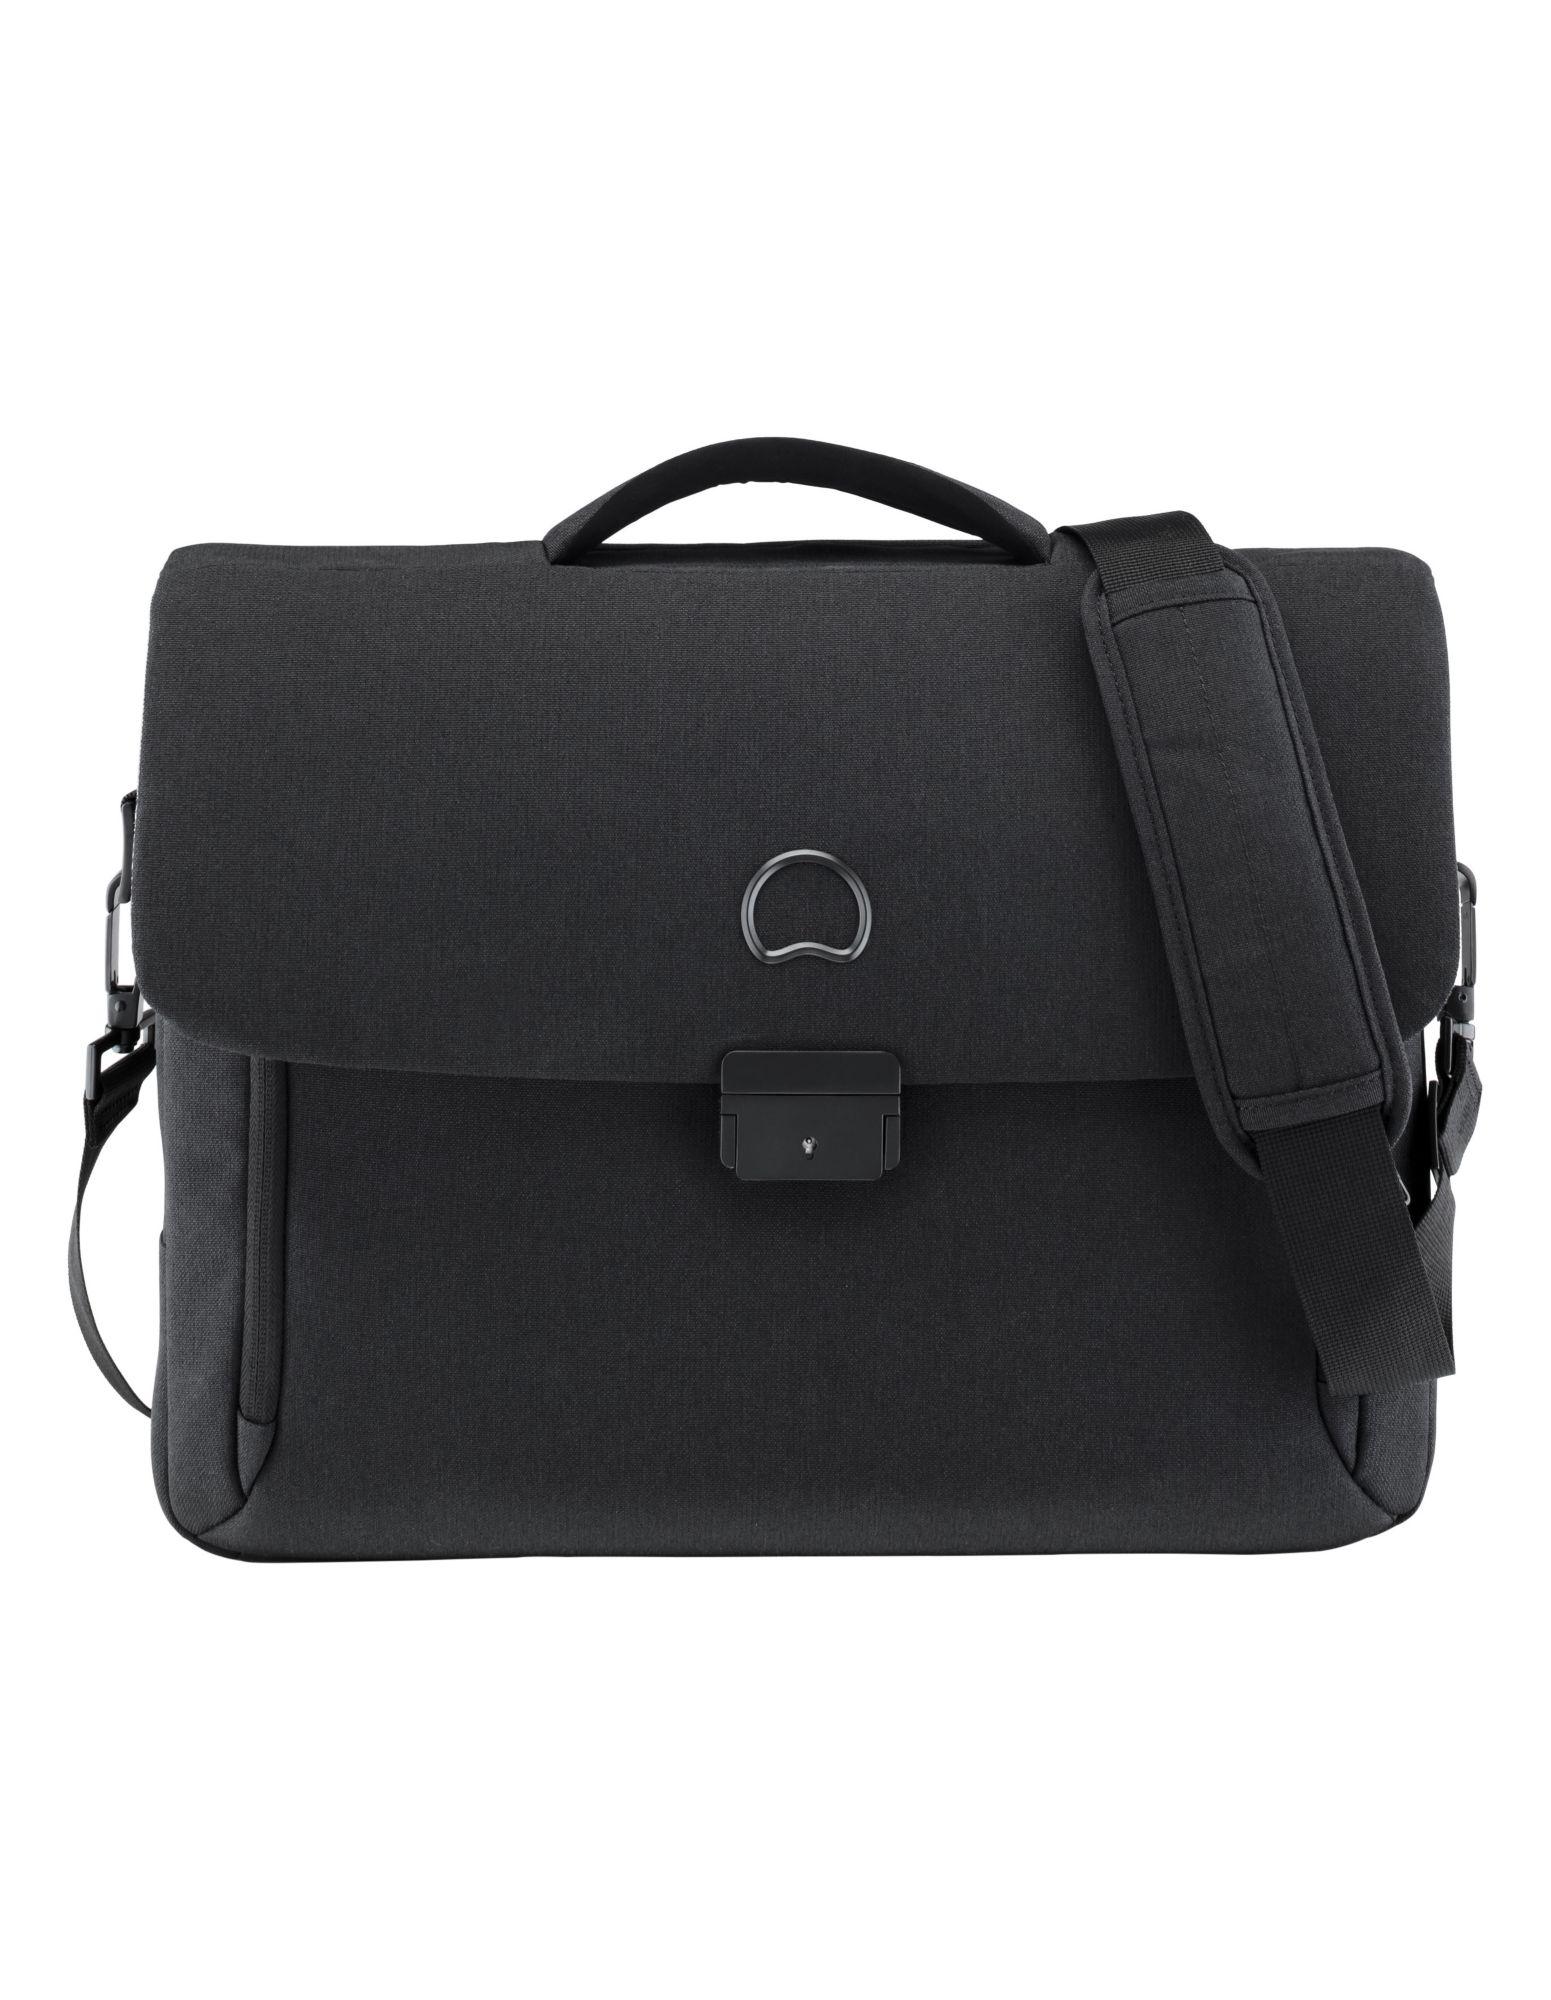 DELSEY  Businesstasche mit 14-Zoll Laptopfach , »Mouvement«